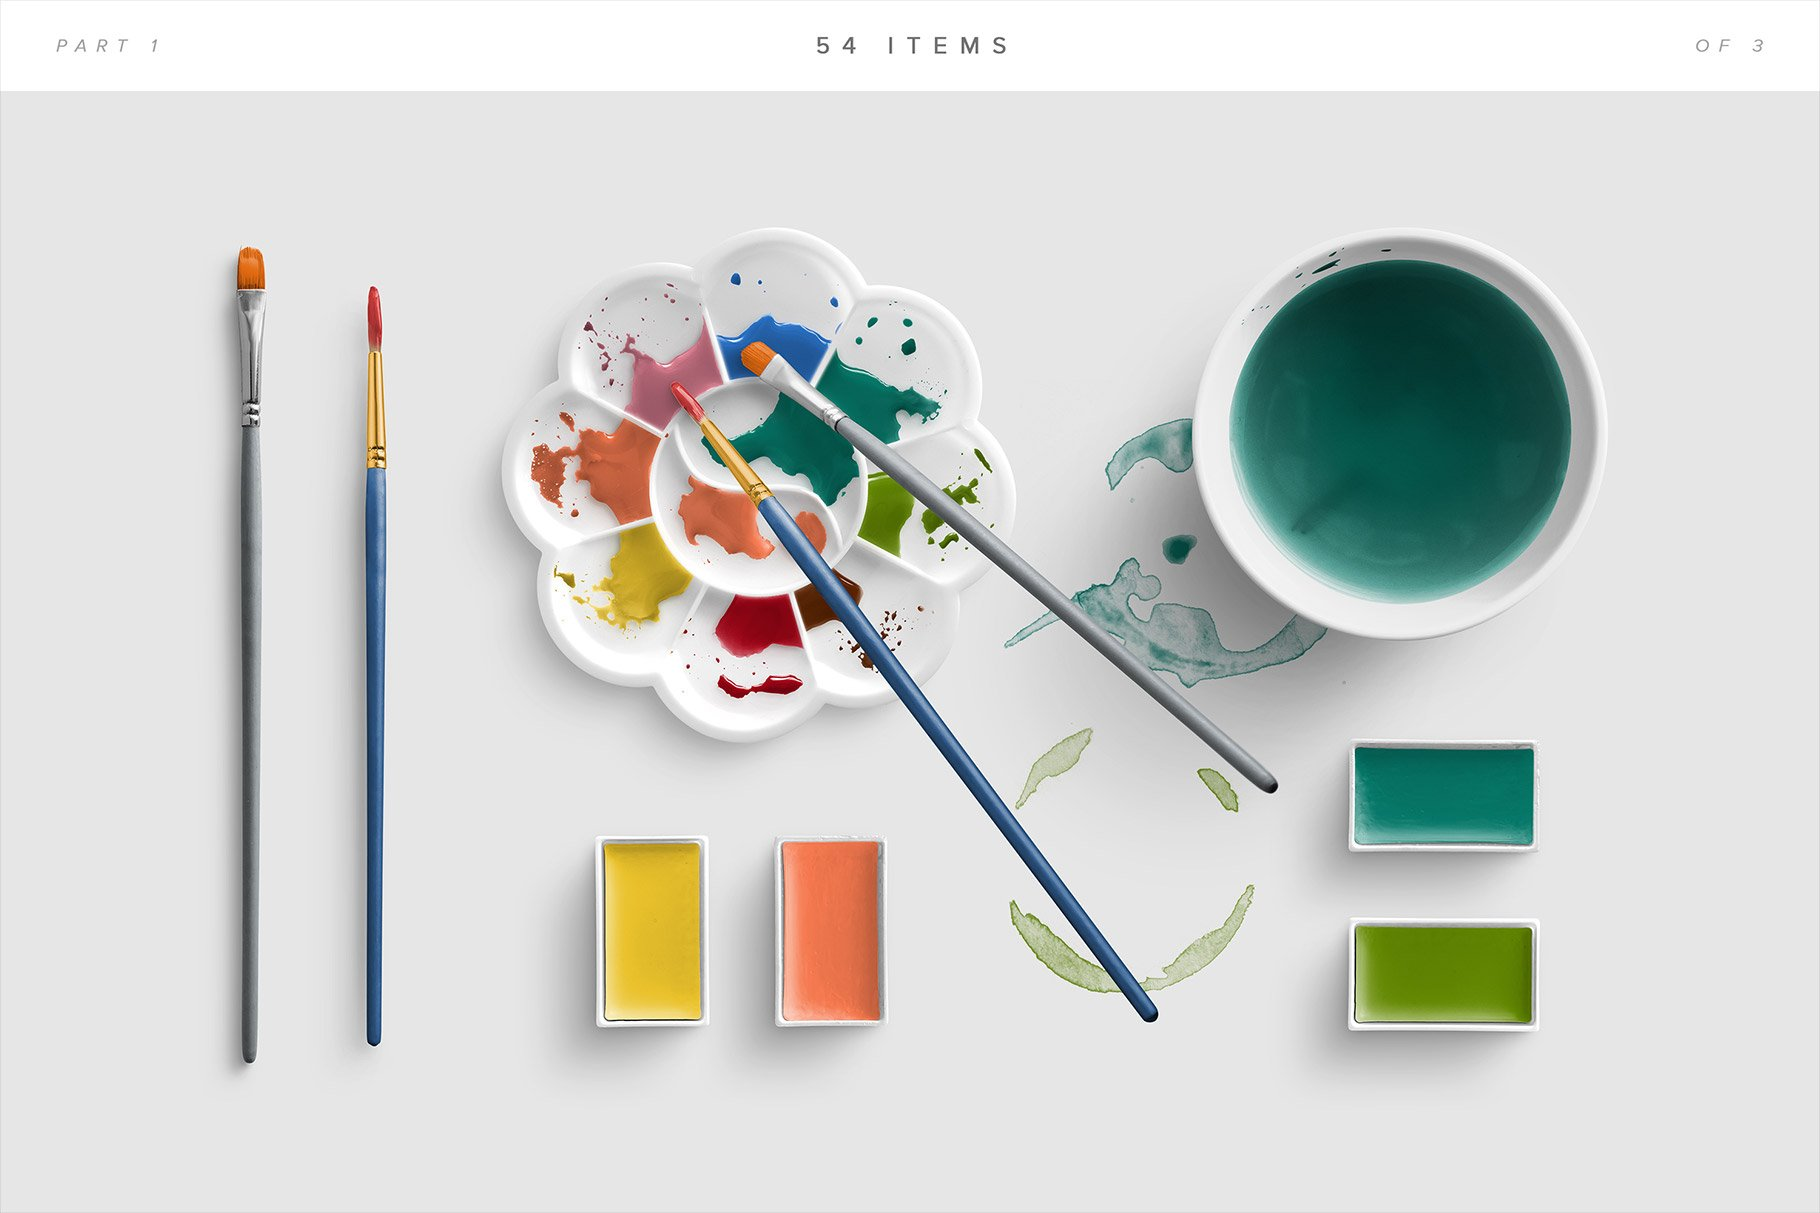 watercolor mockup scene creator procreate5 3a list of items